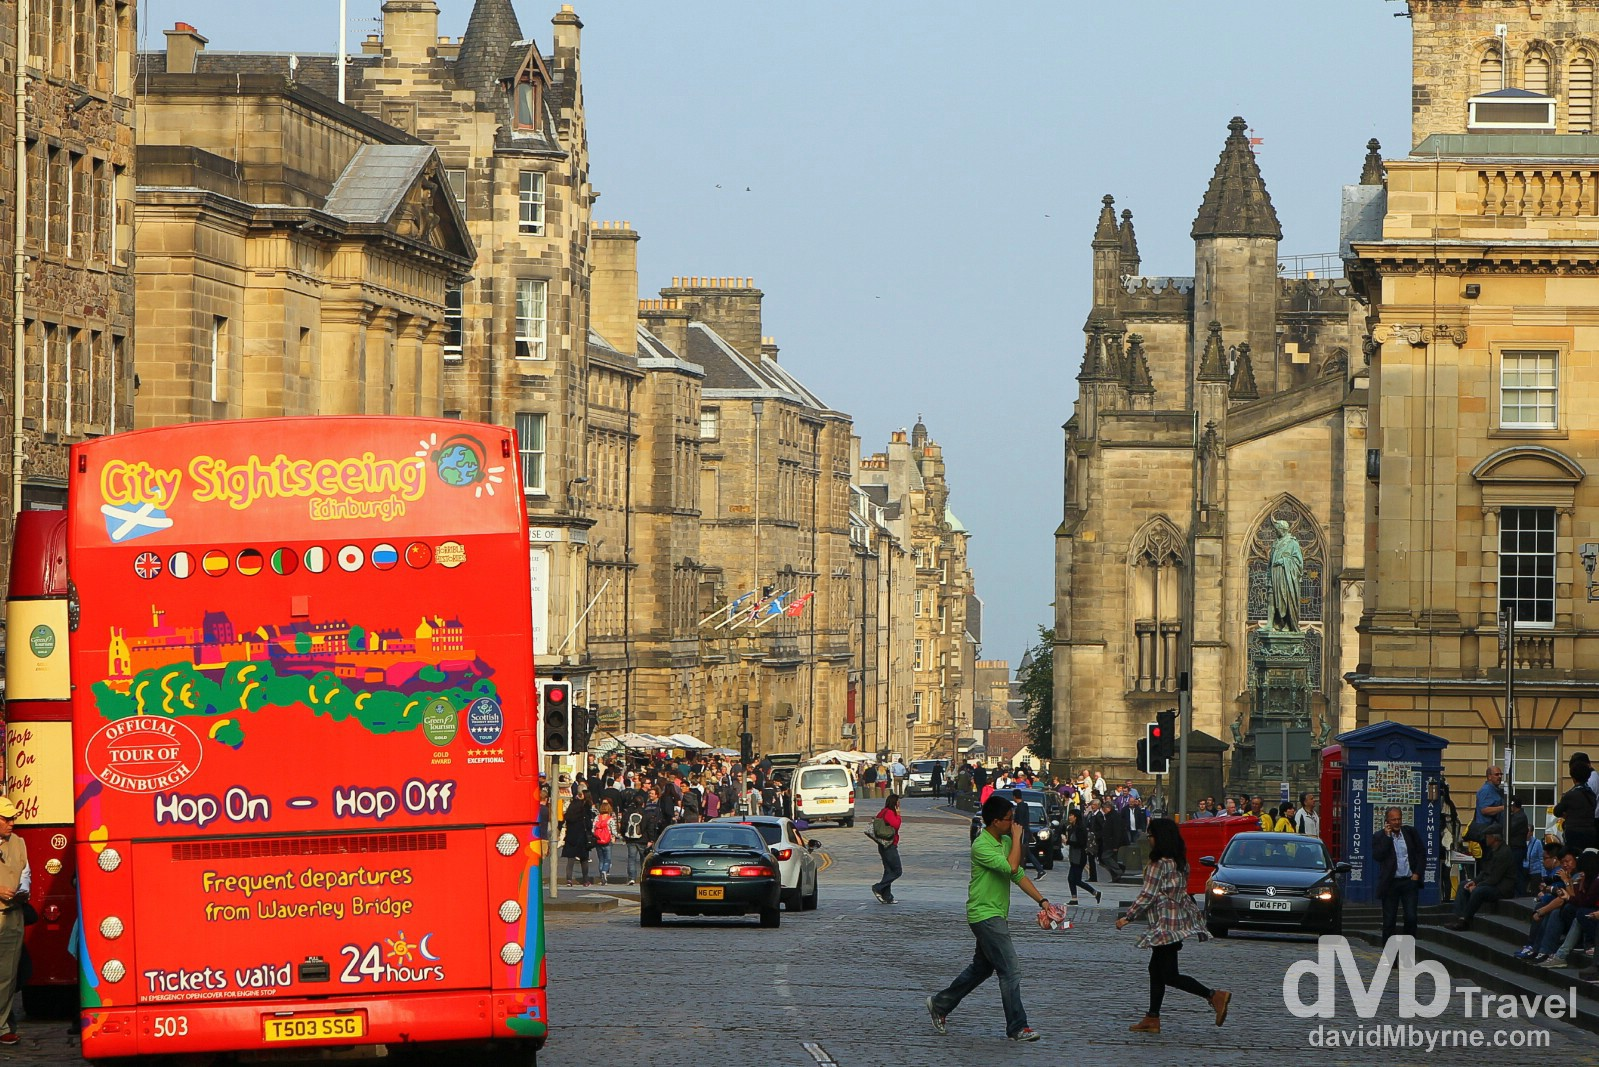 Royal Mile, Edinburgh, Scotland. September 12, 2014.